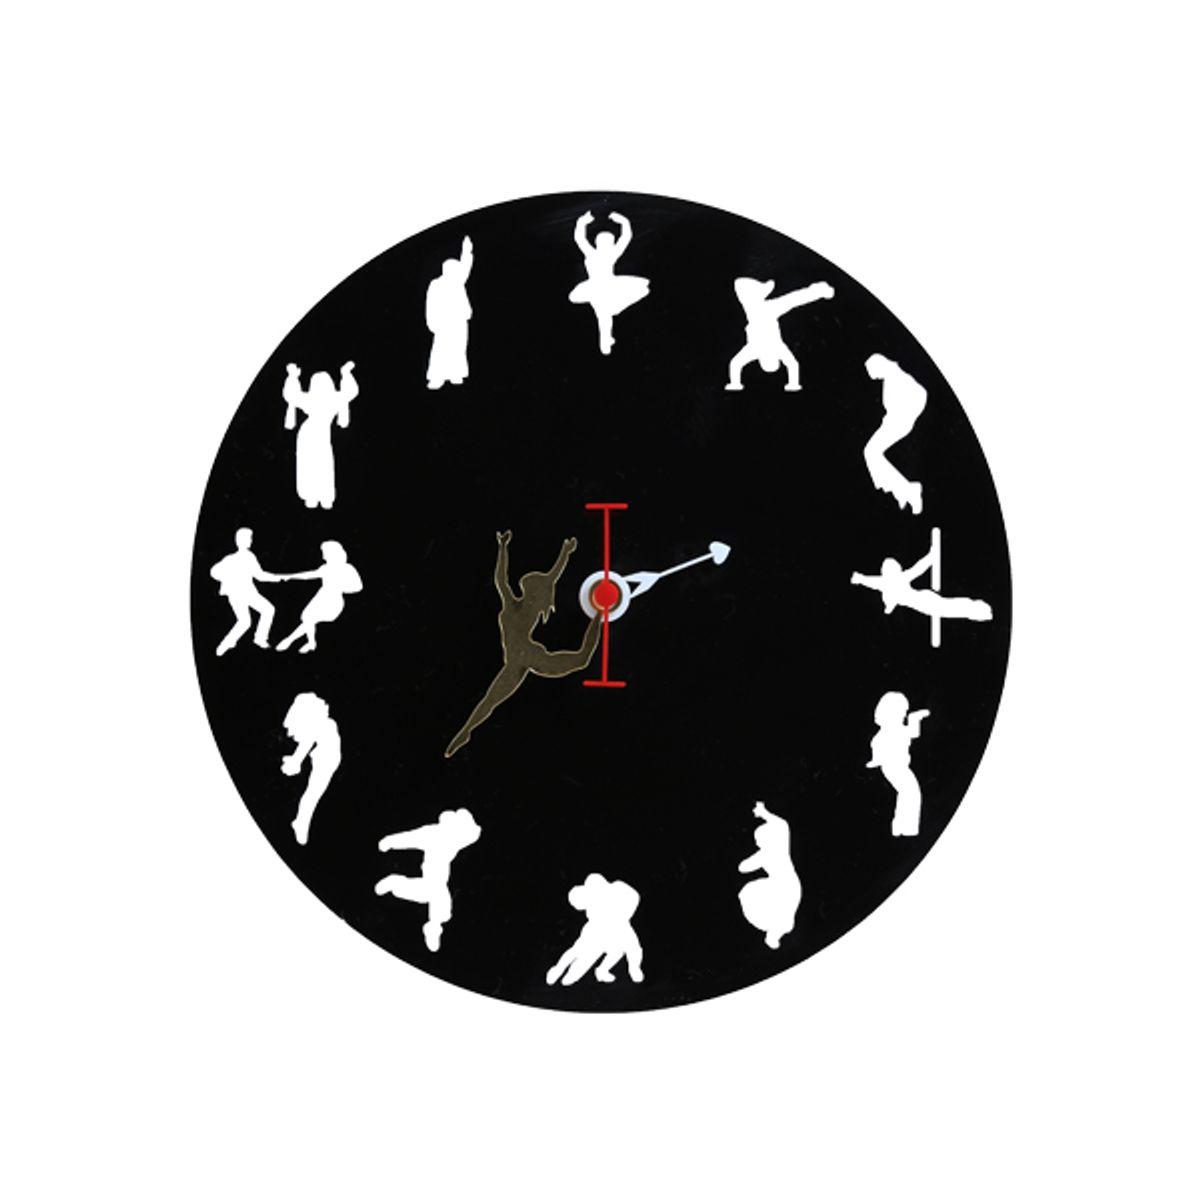 I LOVE DANCING WALL CLOCK